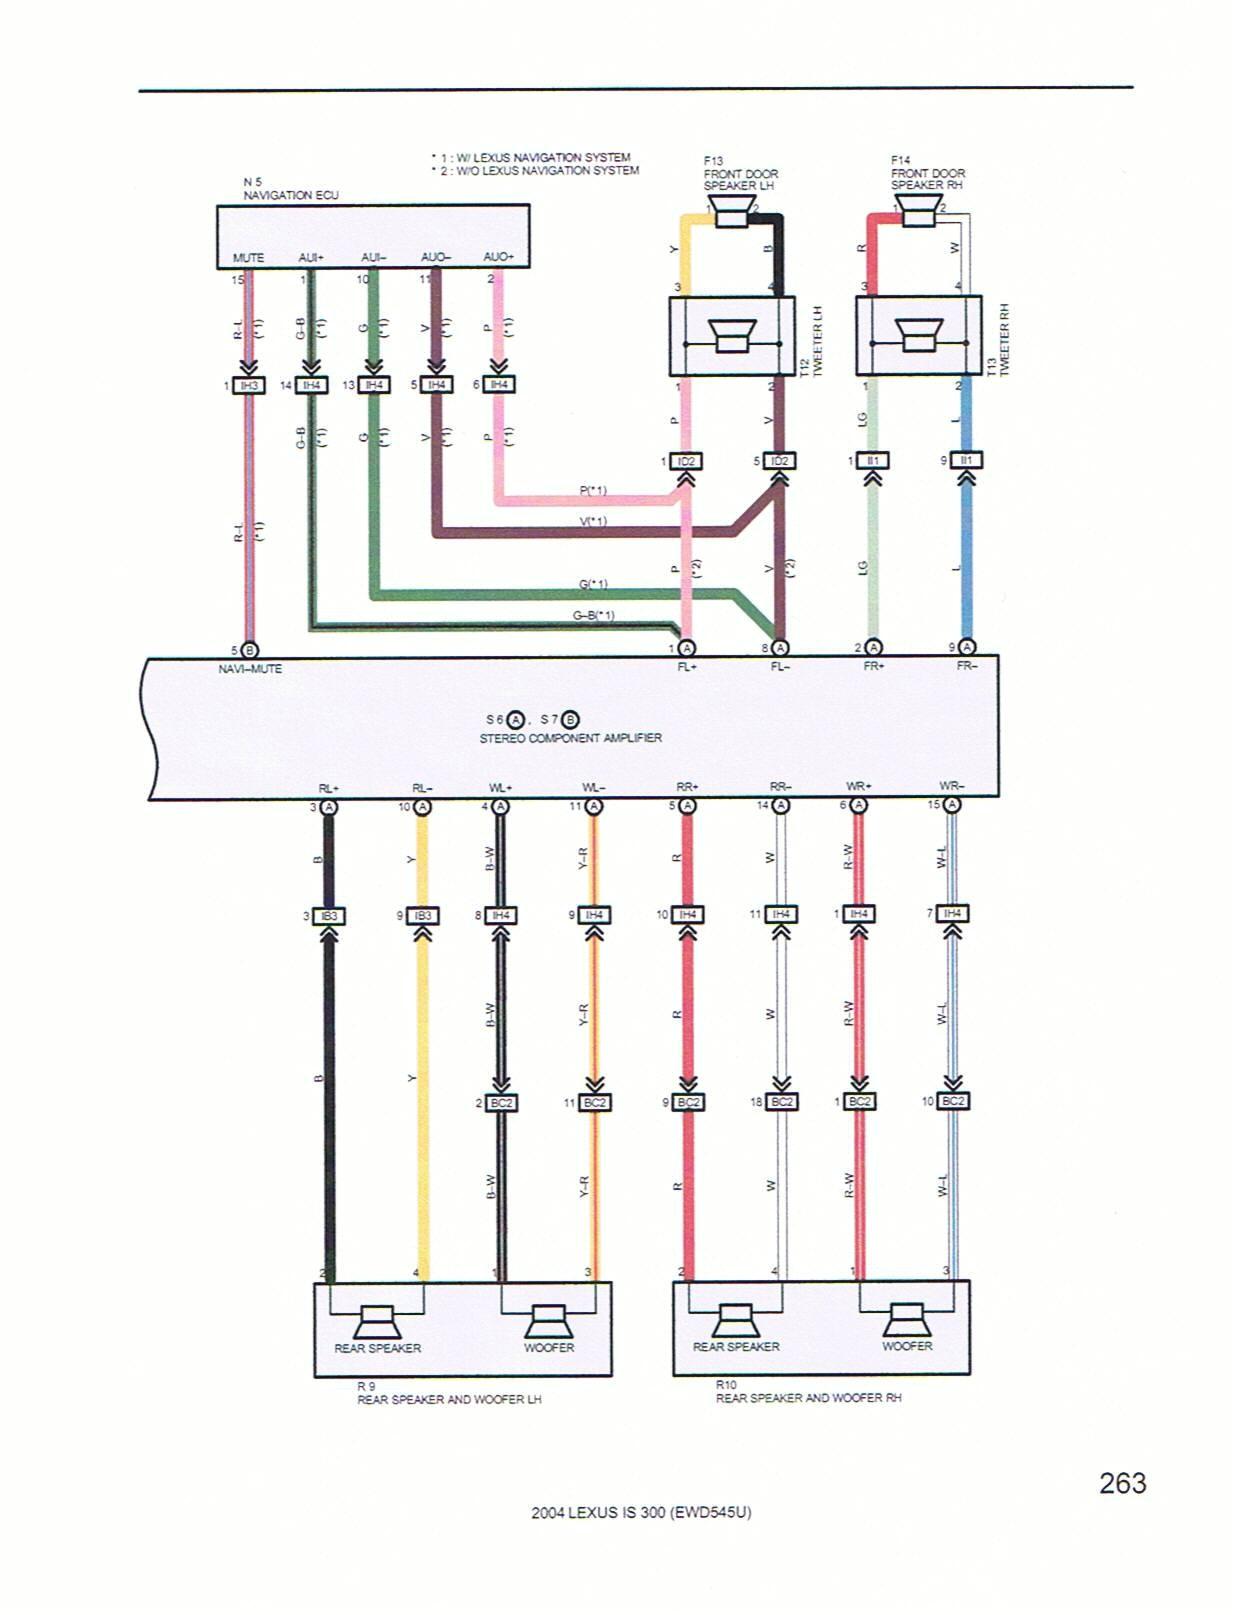 2002 vw jetta wiring diagram wiring diagram schemavw jetta wiring diagram pdf wiring diagram recent 2002